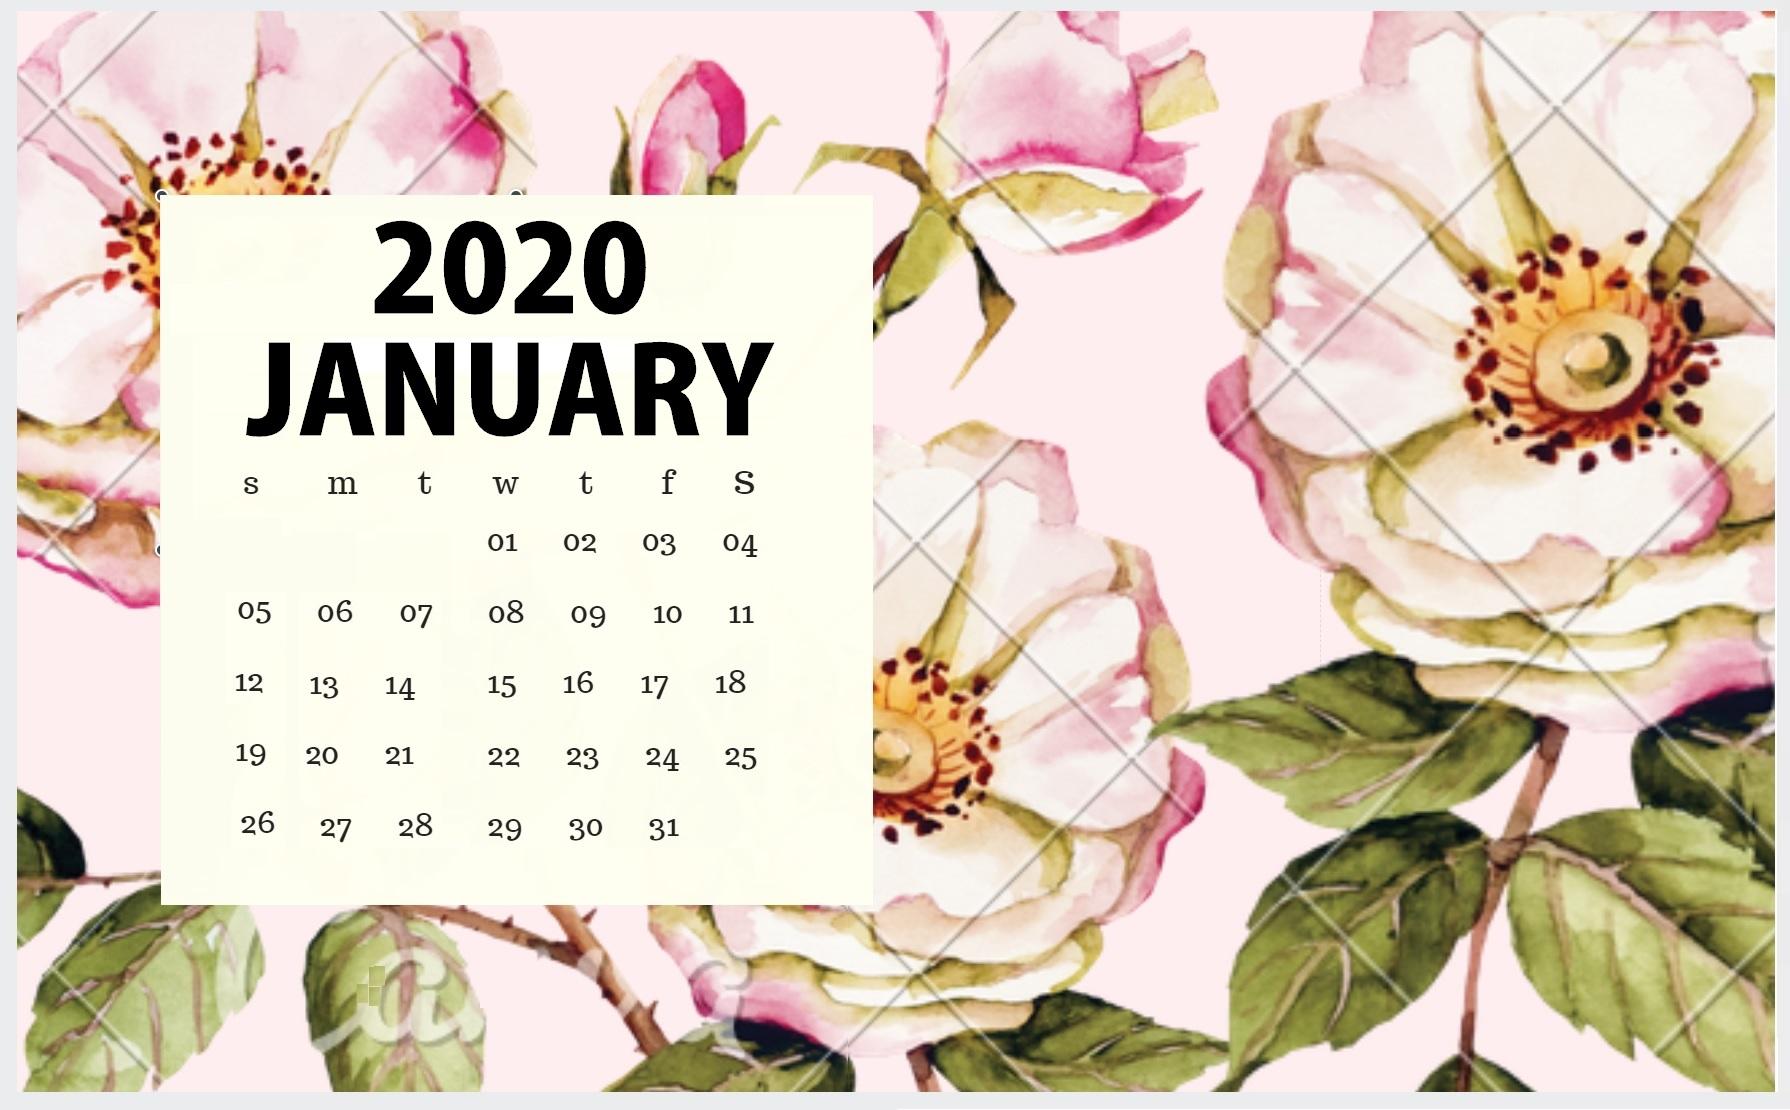 Floral January 2020 Desktop Calendar Wallpaper